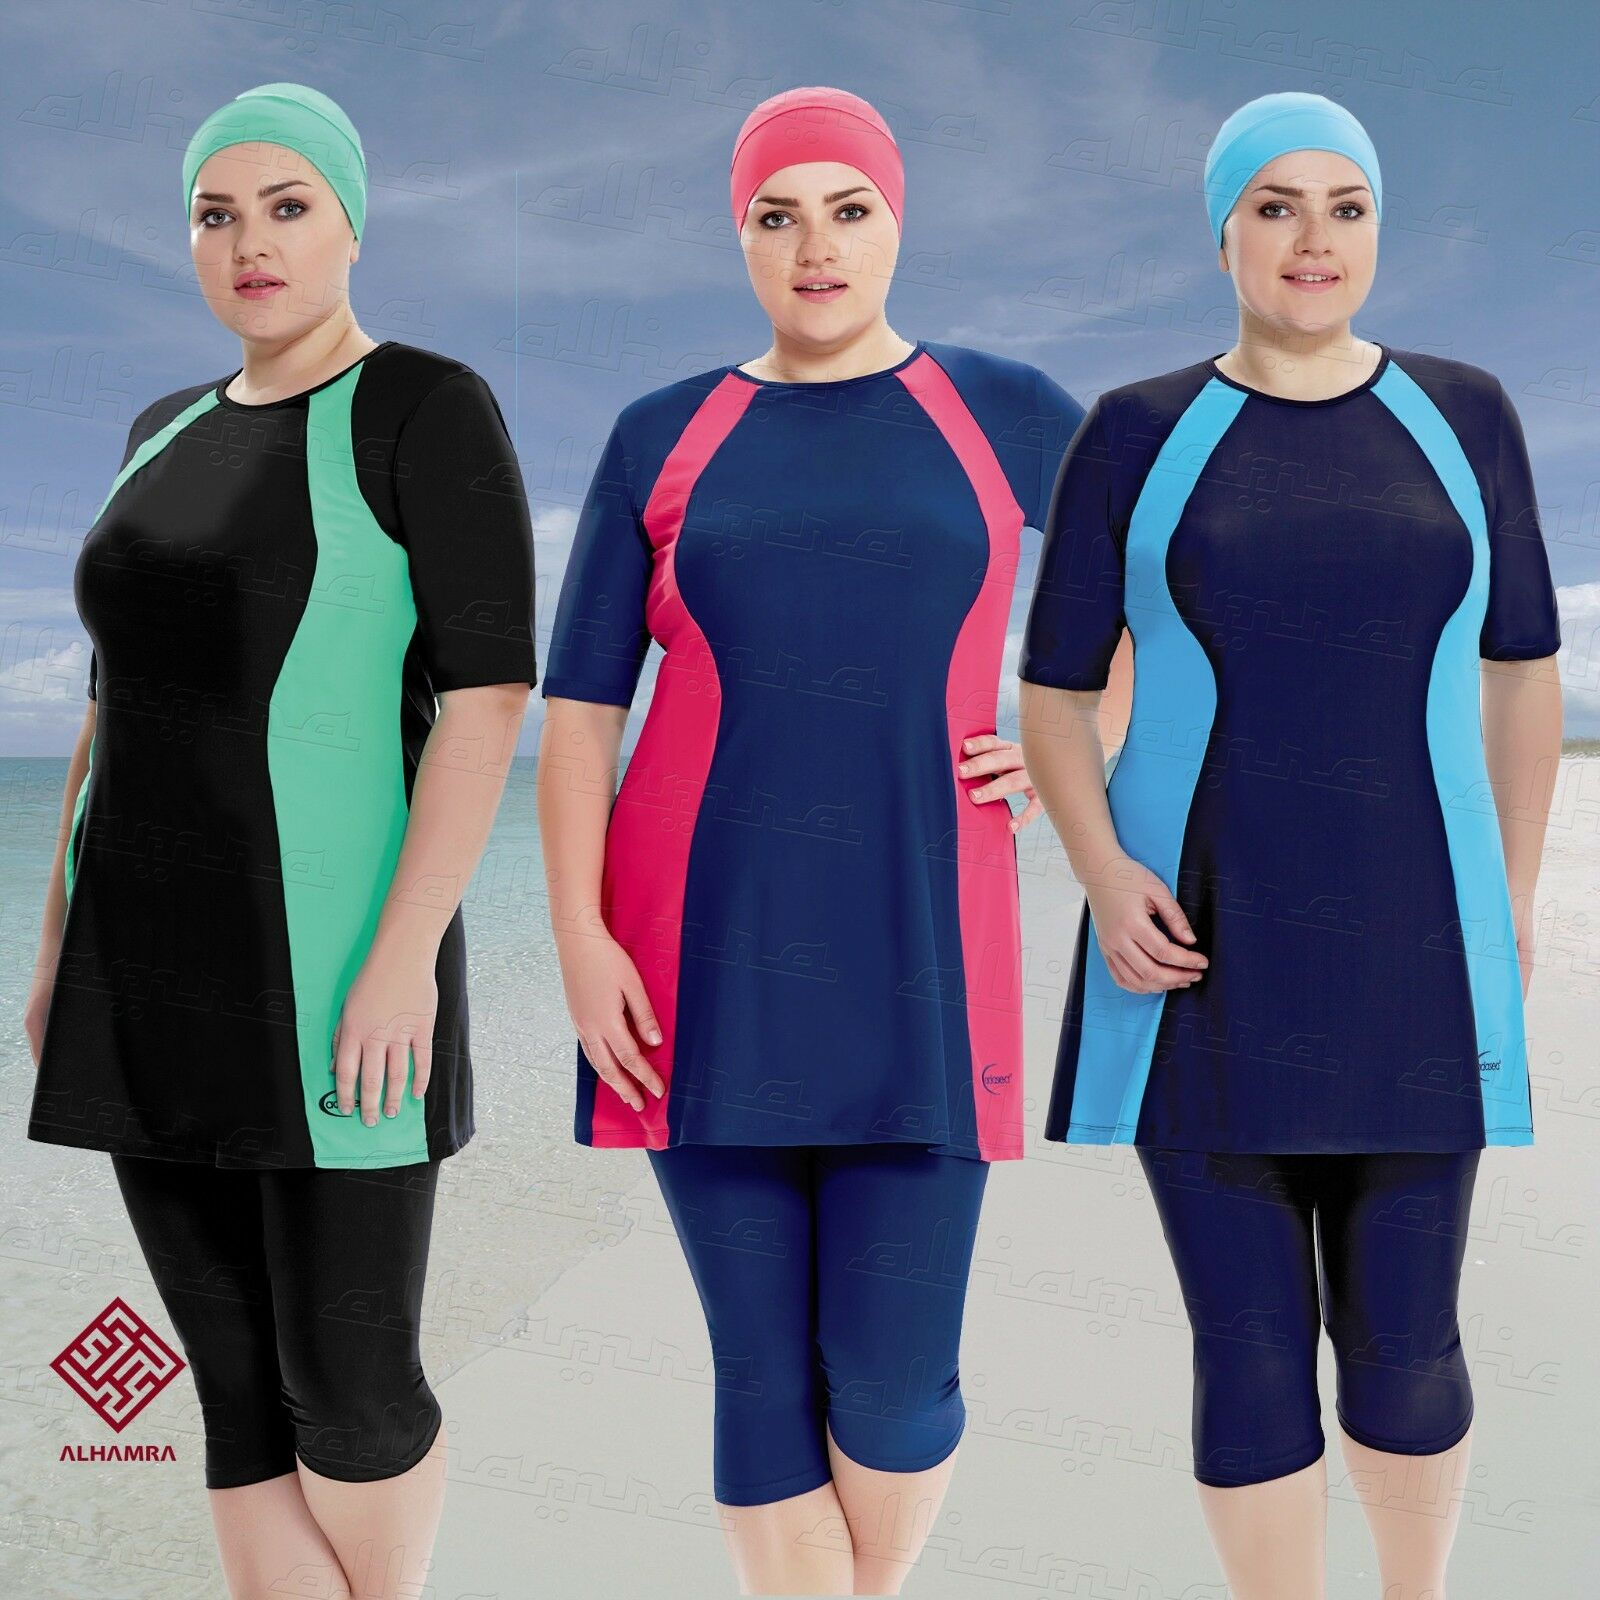 AlHamra Semi Cover Marina Burkini Modest Women Swimsuit Muslim Plus Size 3XL-6XL